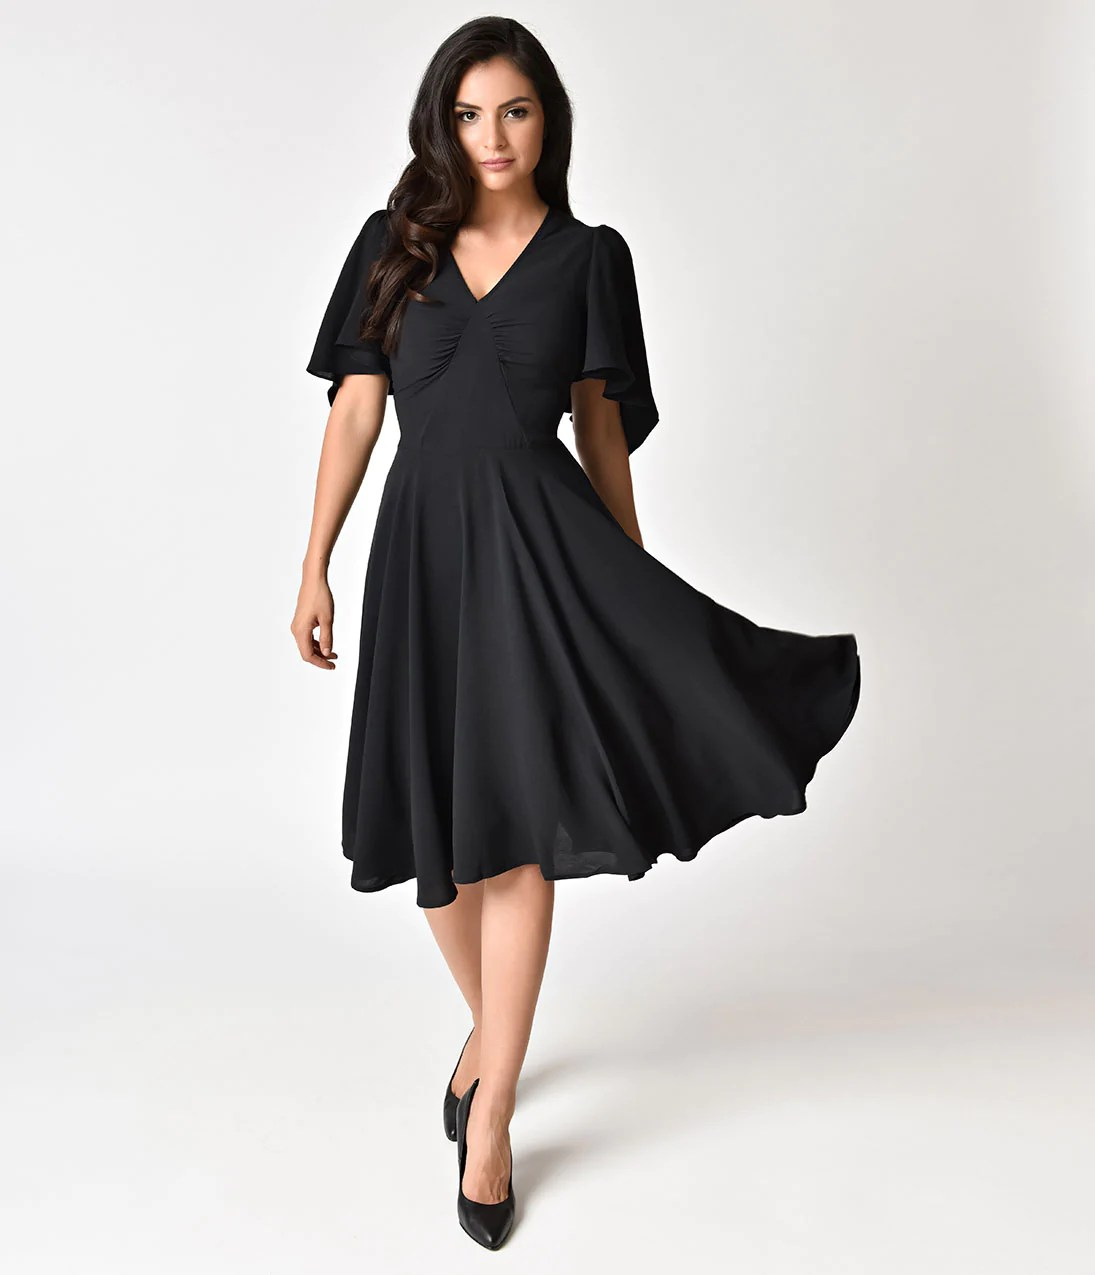 1940s Style Dresses for Women